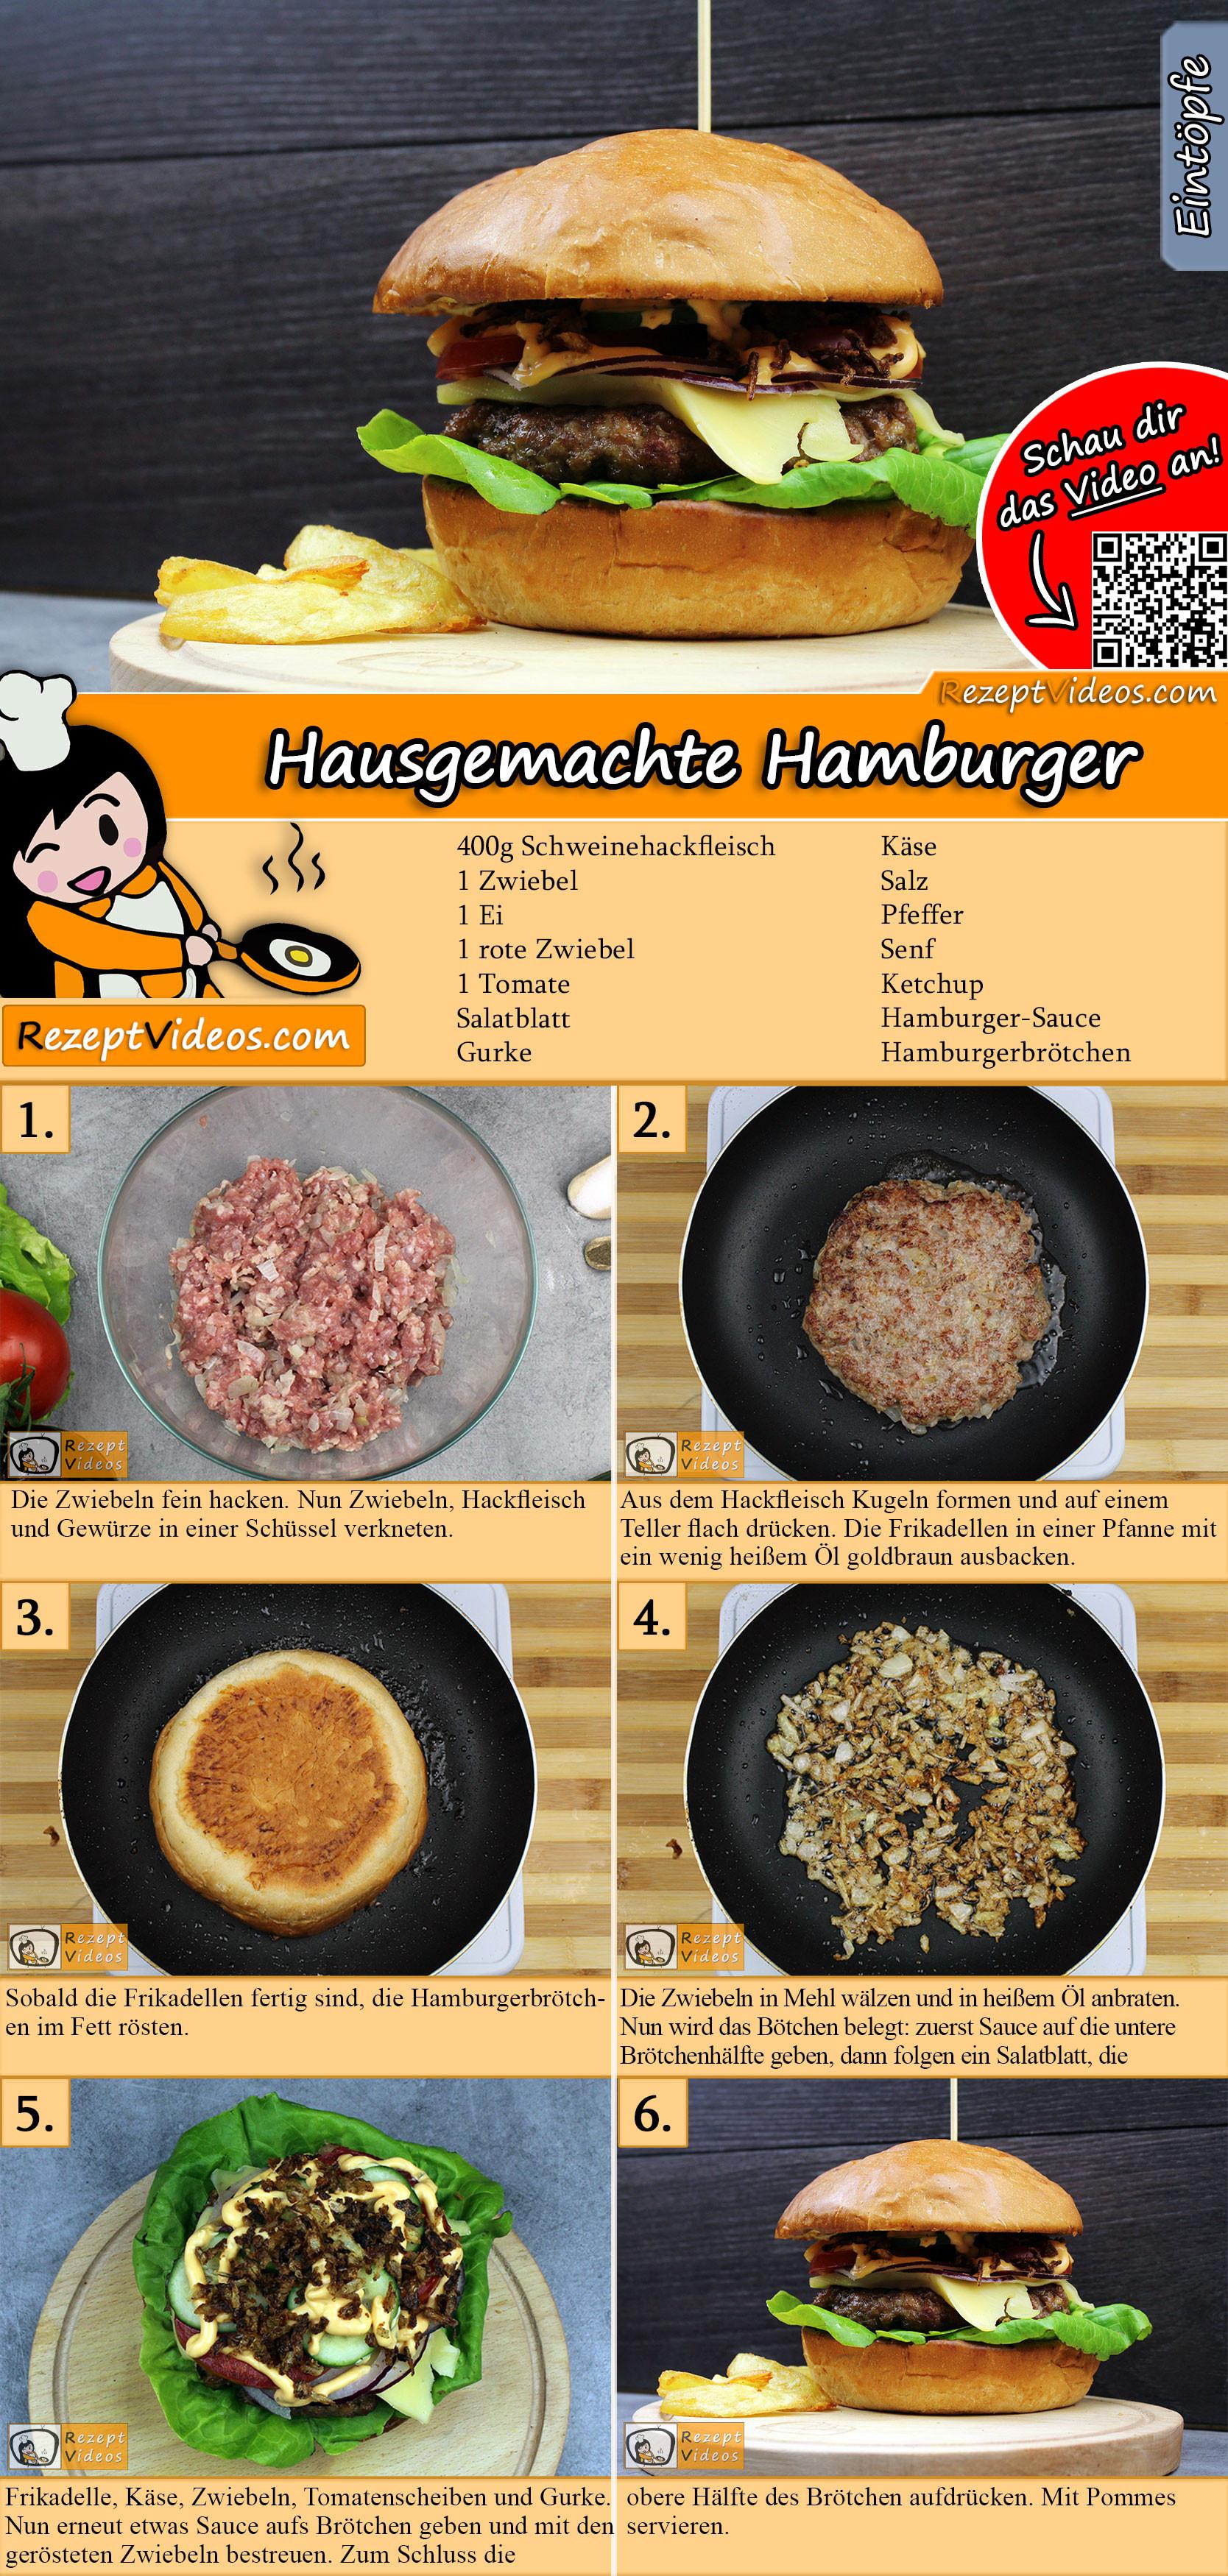 hausgemachte hamburger hamburgerrezept hamburger selber machen. Black Bedroom Furniture Sets. Home Design Ideas